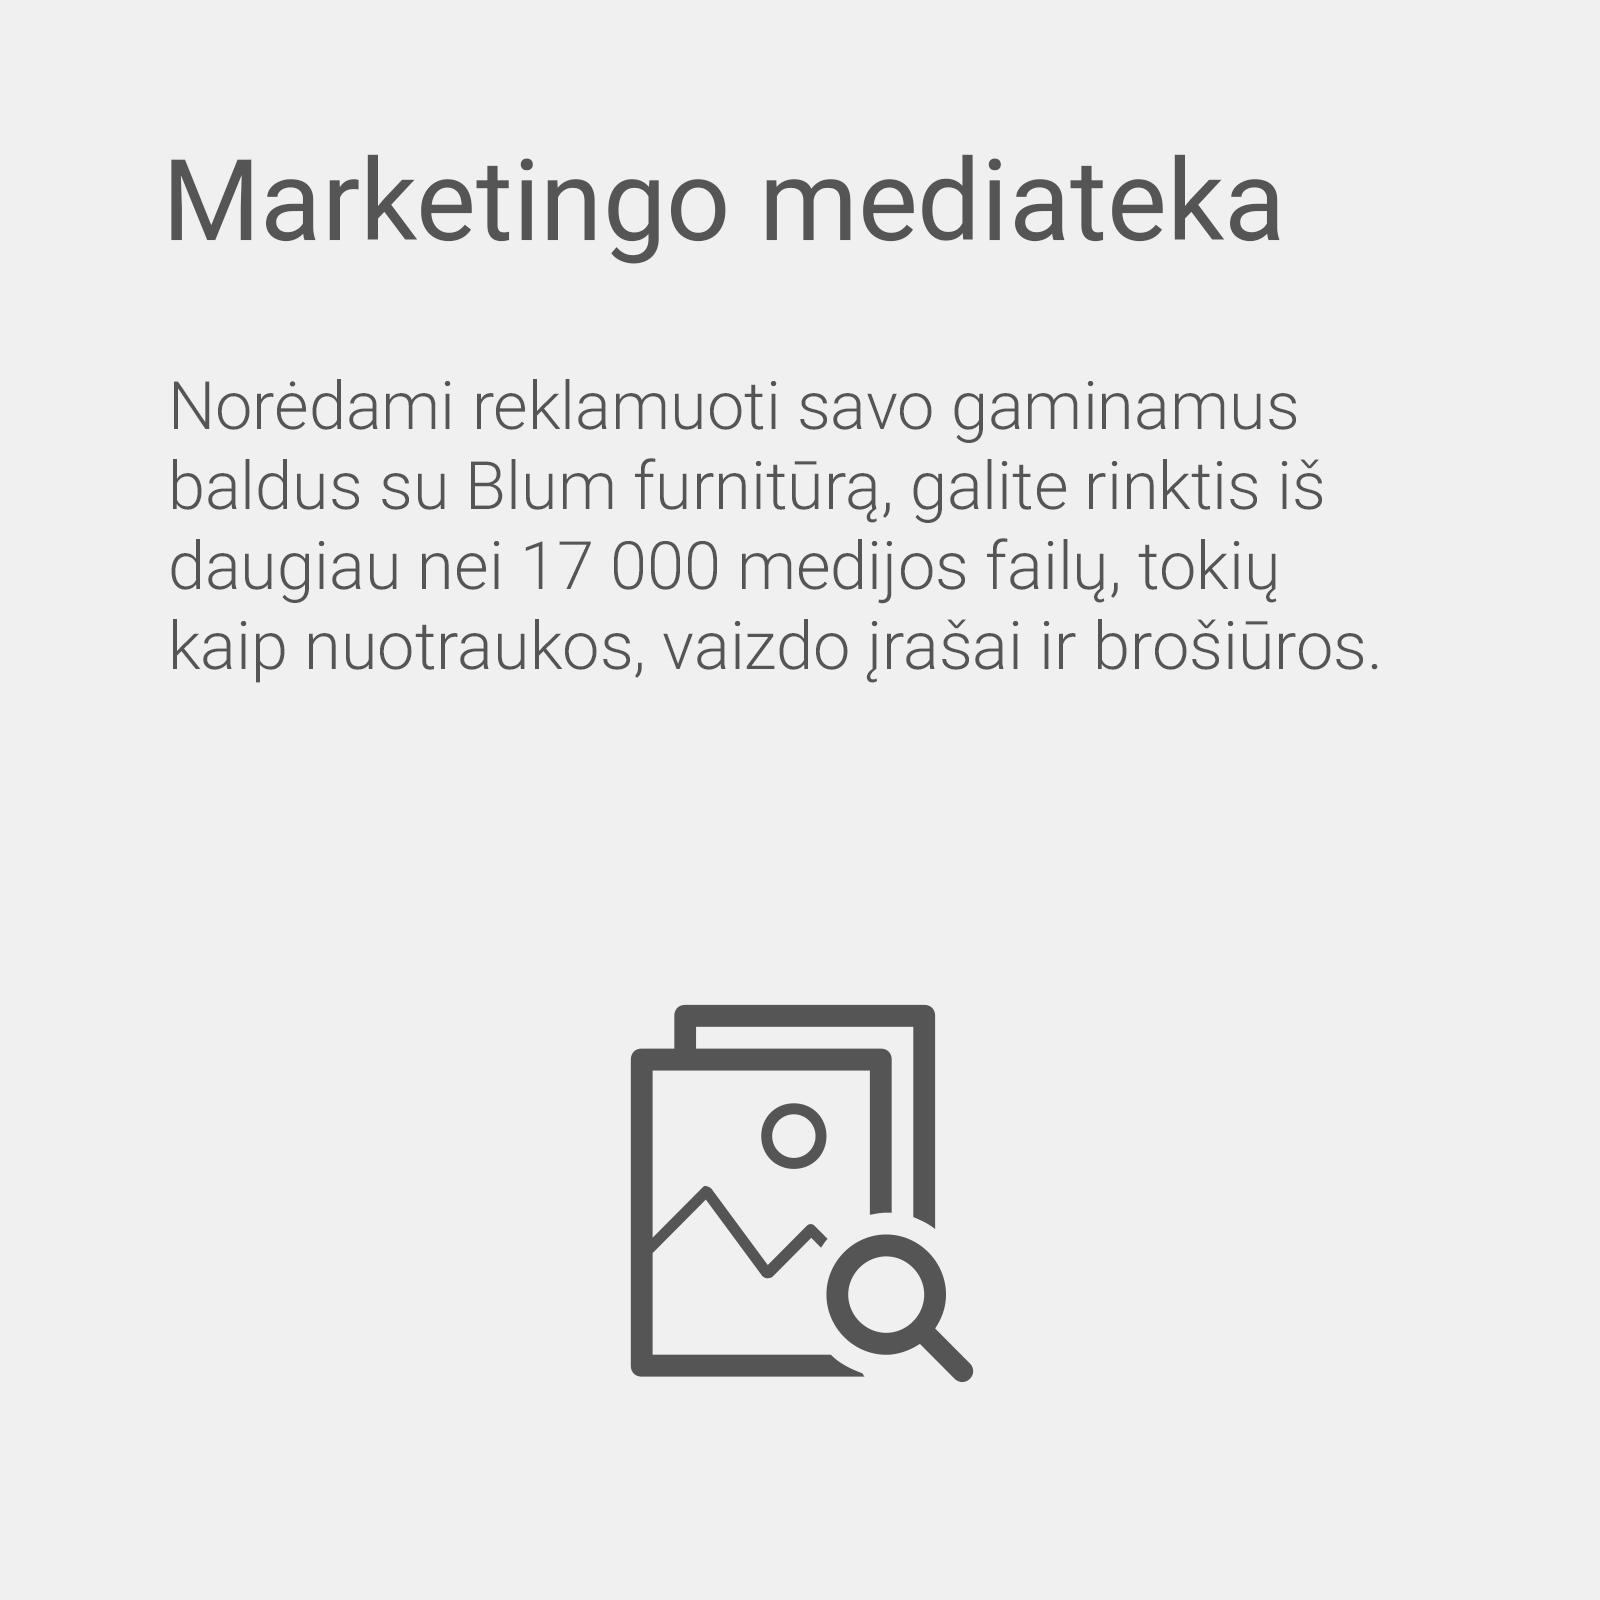 e-services_marketingo_mediateka